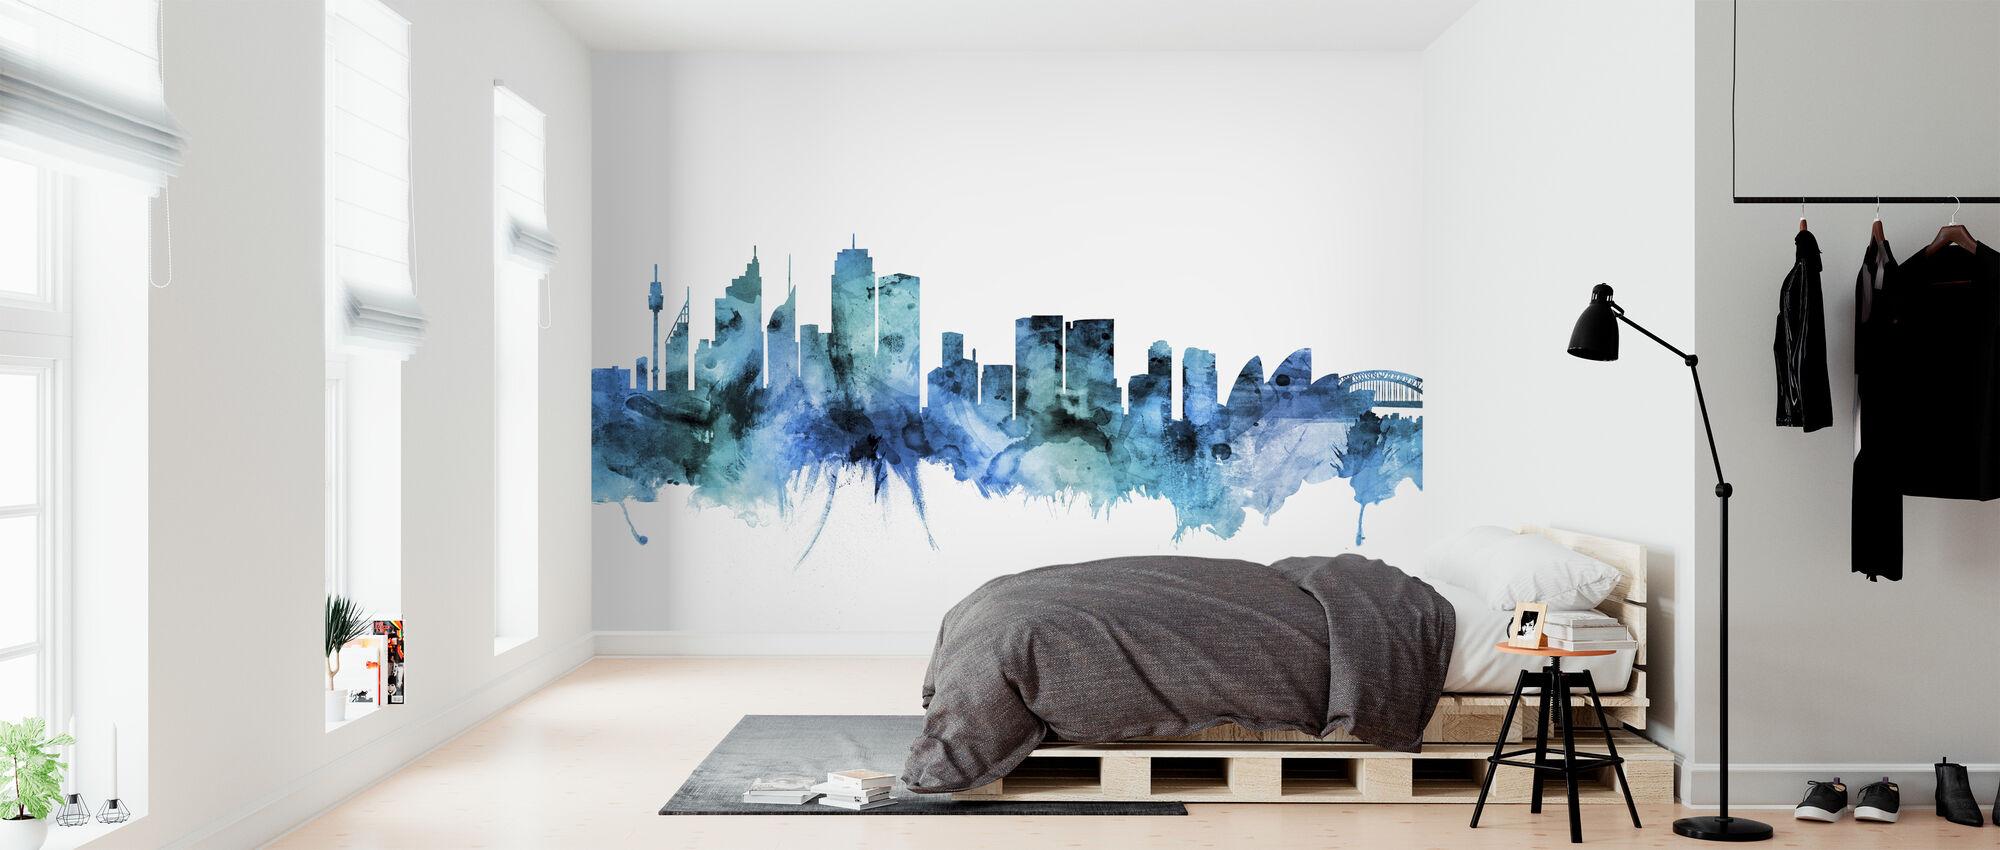 Sydney Australia Skyline - Wallpaper - Bedroom